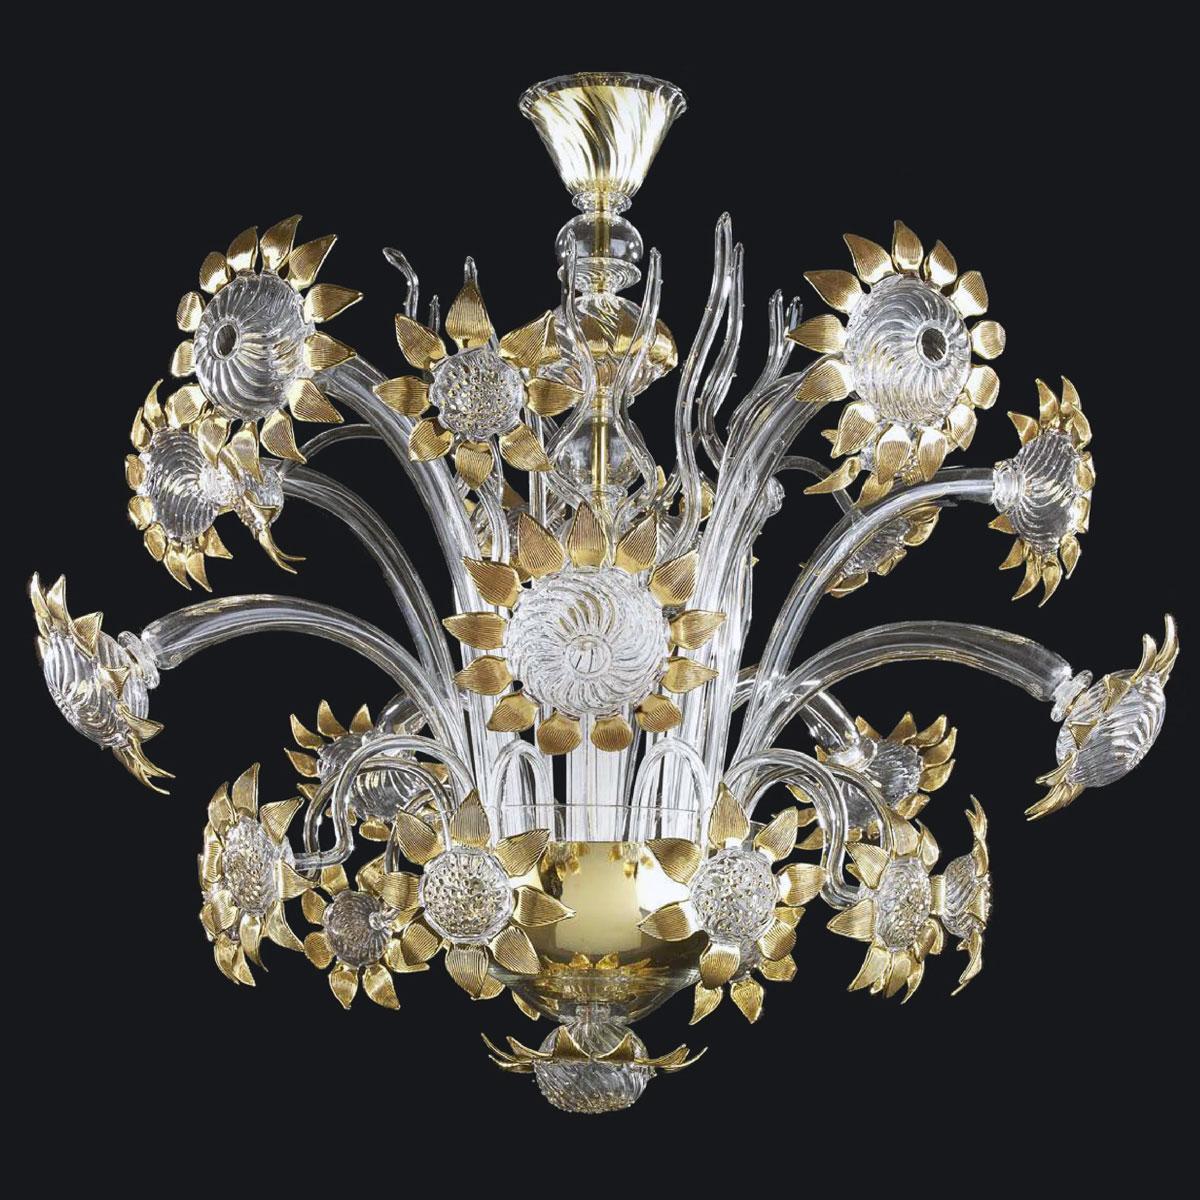 """Allegra"" lampara de araña de Murano - 5+5 luces - transparente y oro"